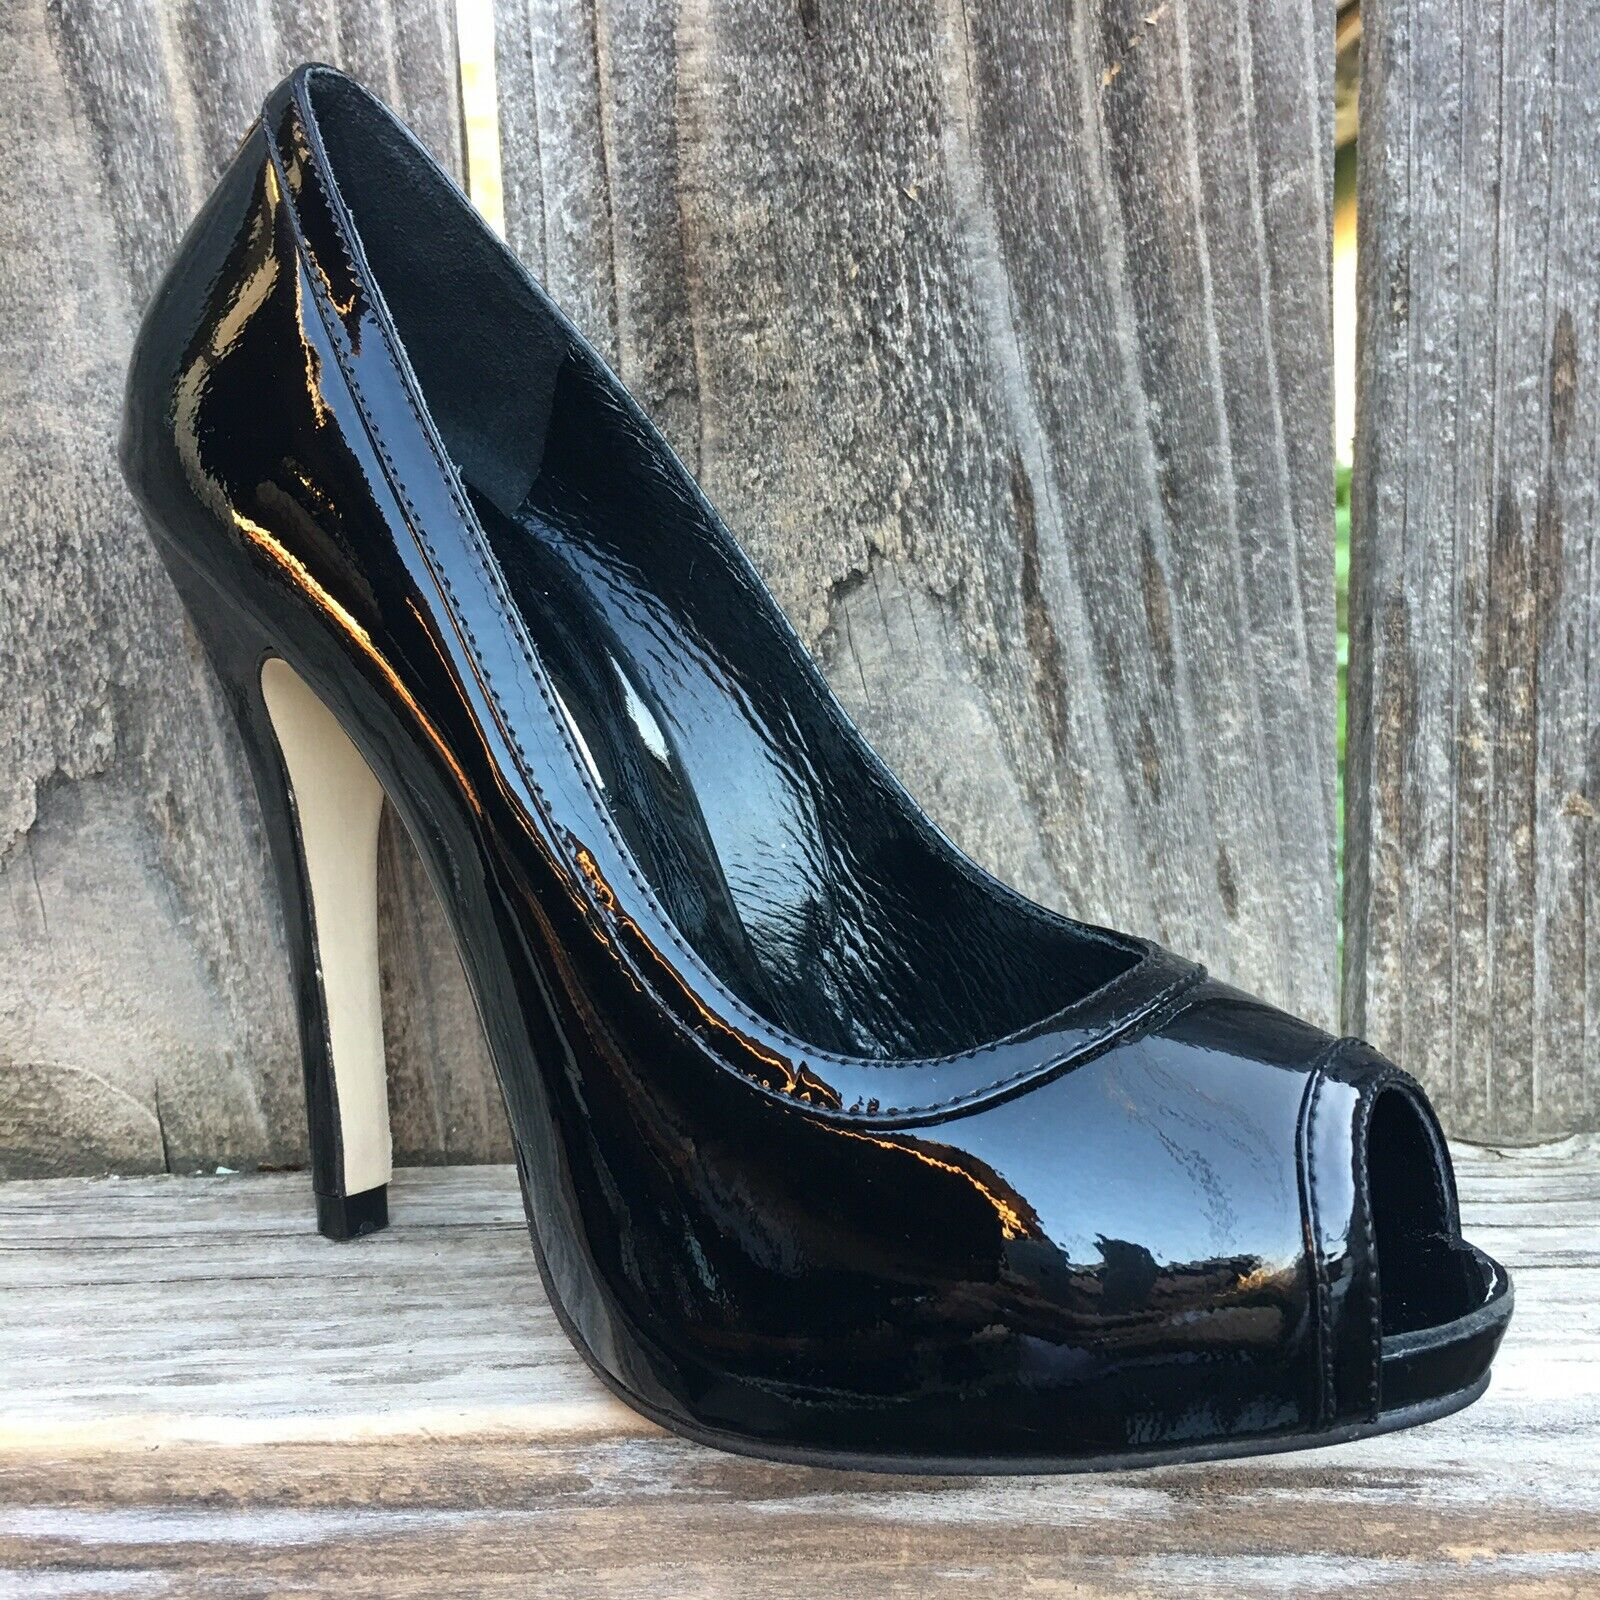 Katheryn Amberleigh Womens Heels 6.5 Hand Crafted Black Patent Leather Peep Toe